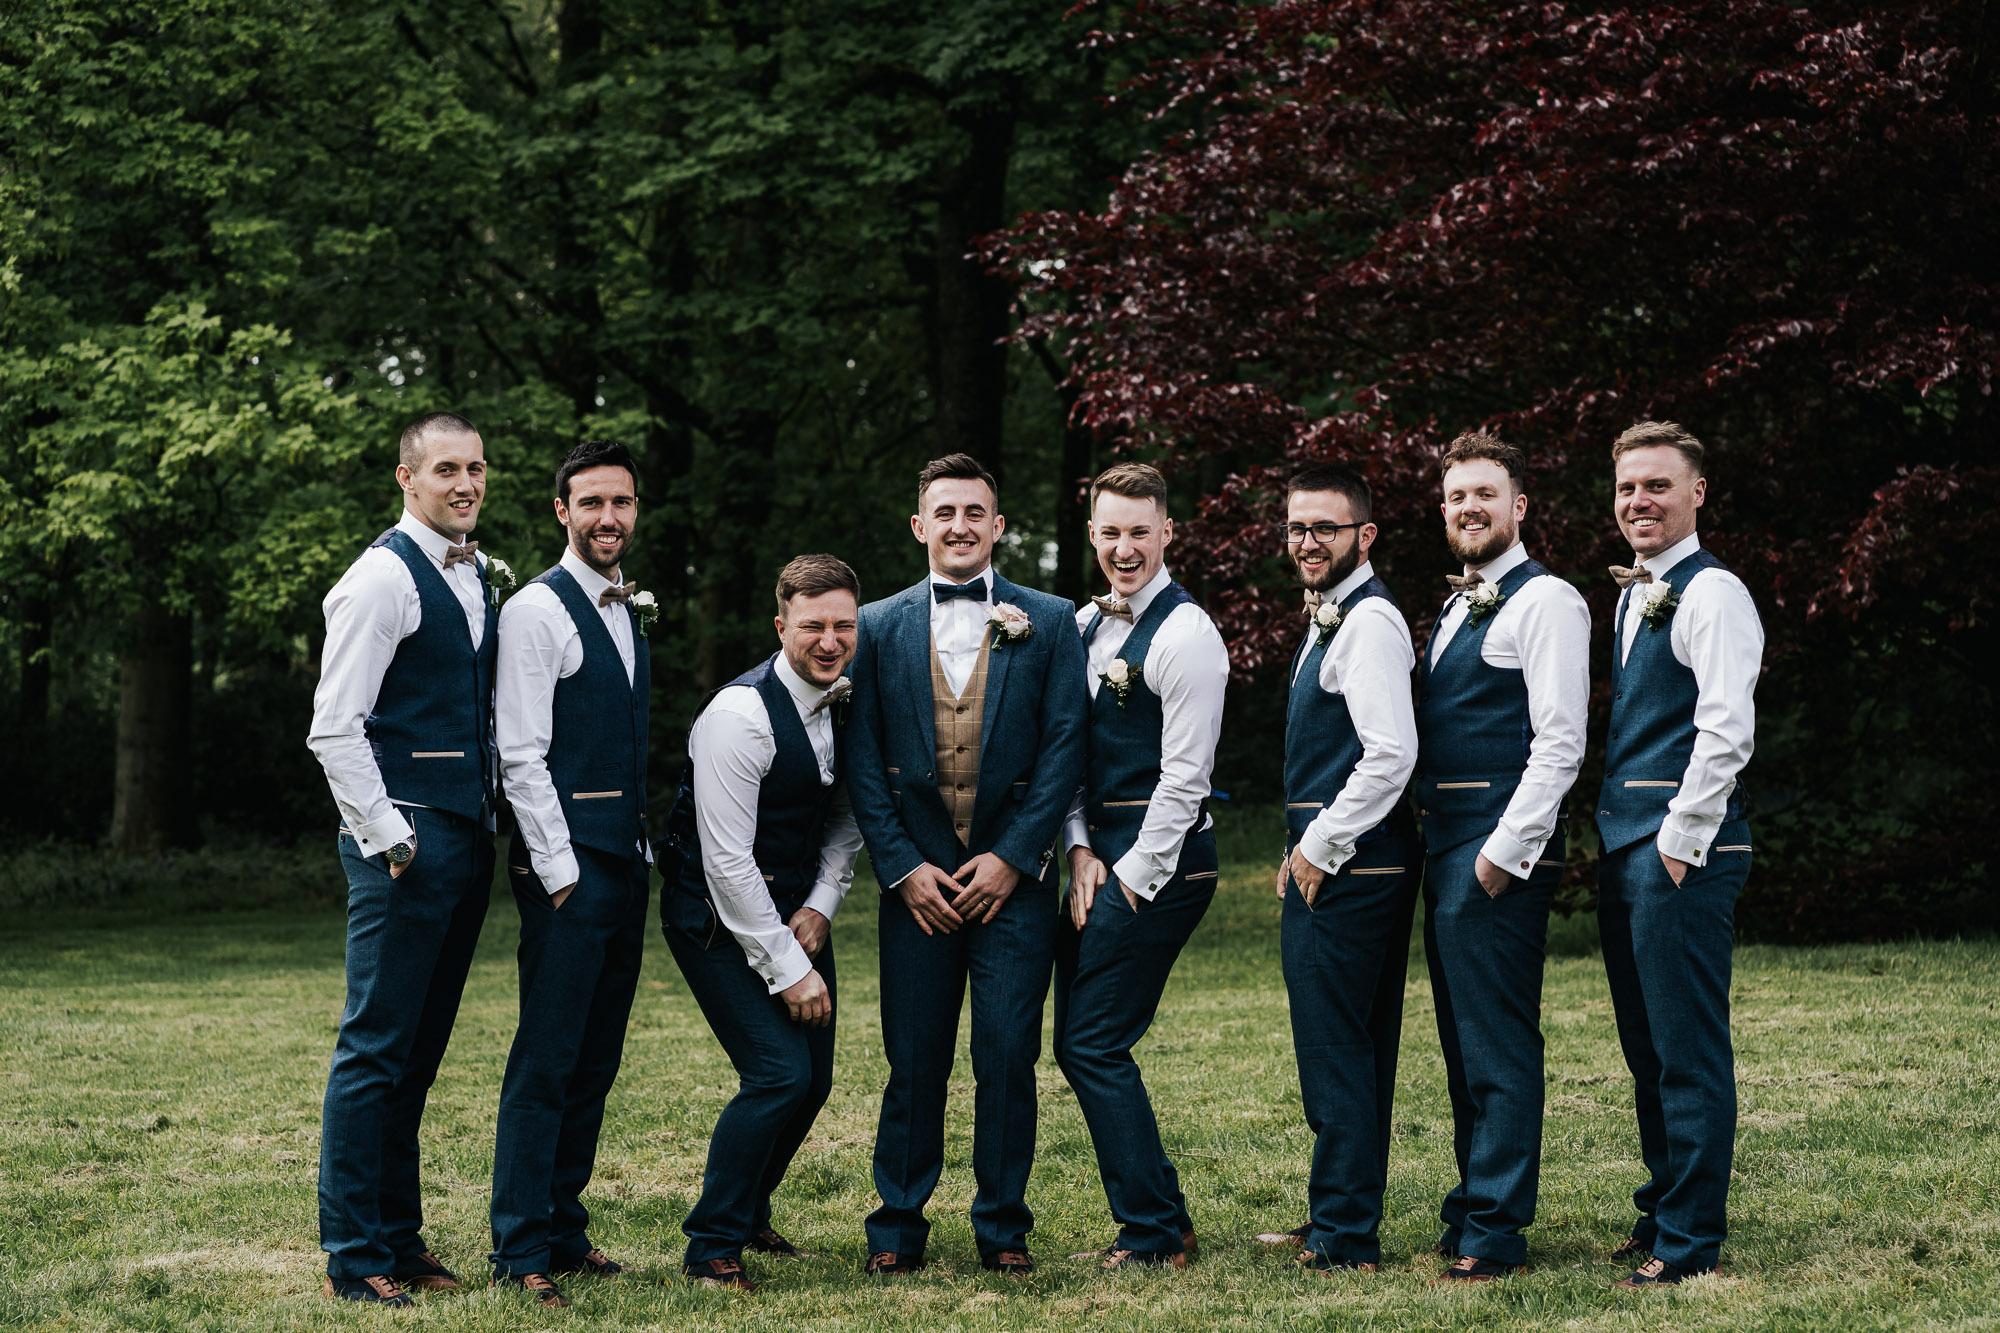 Rivington Hall Barn Wedding PHotographer lancashire wedding photography (23 of 34).jpg